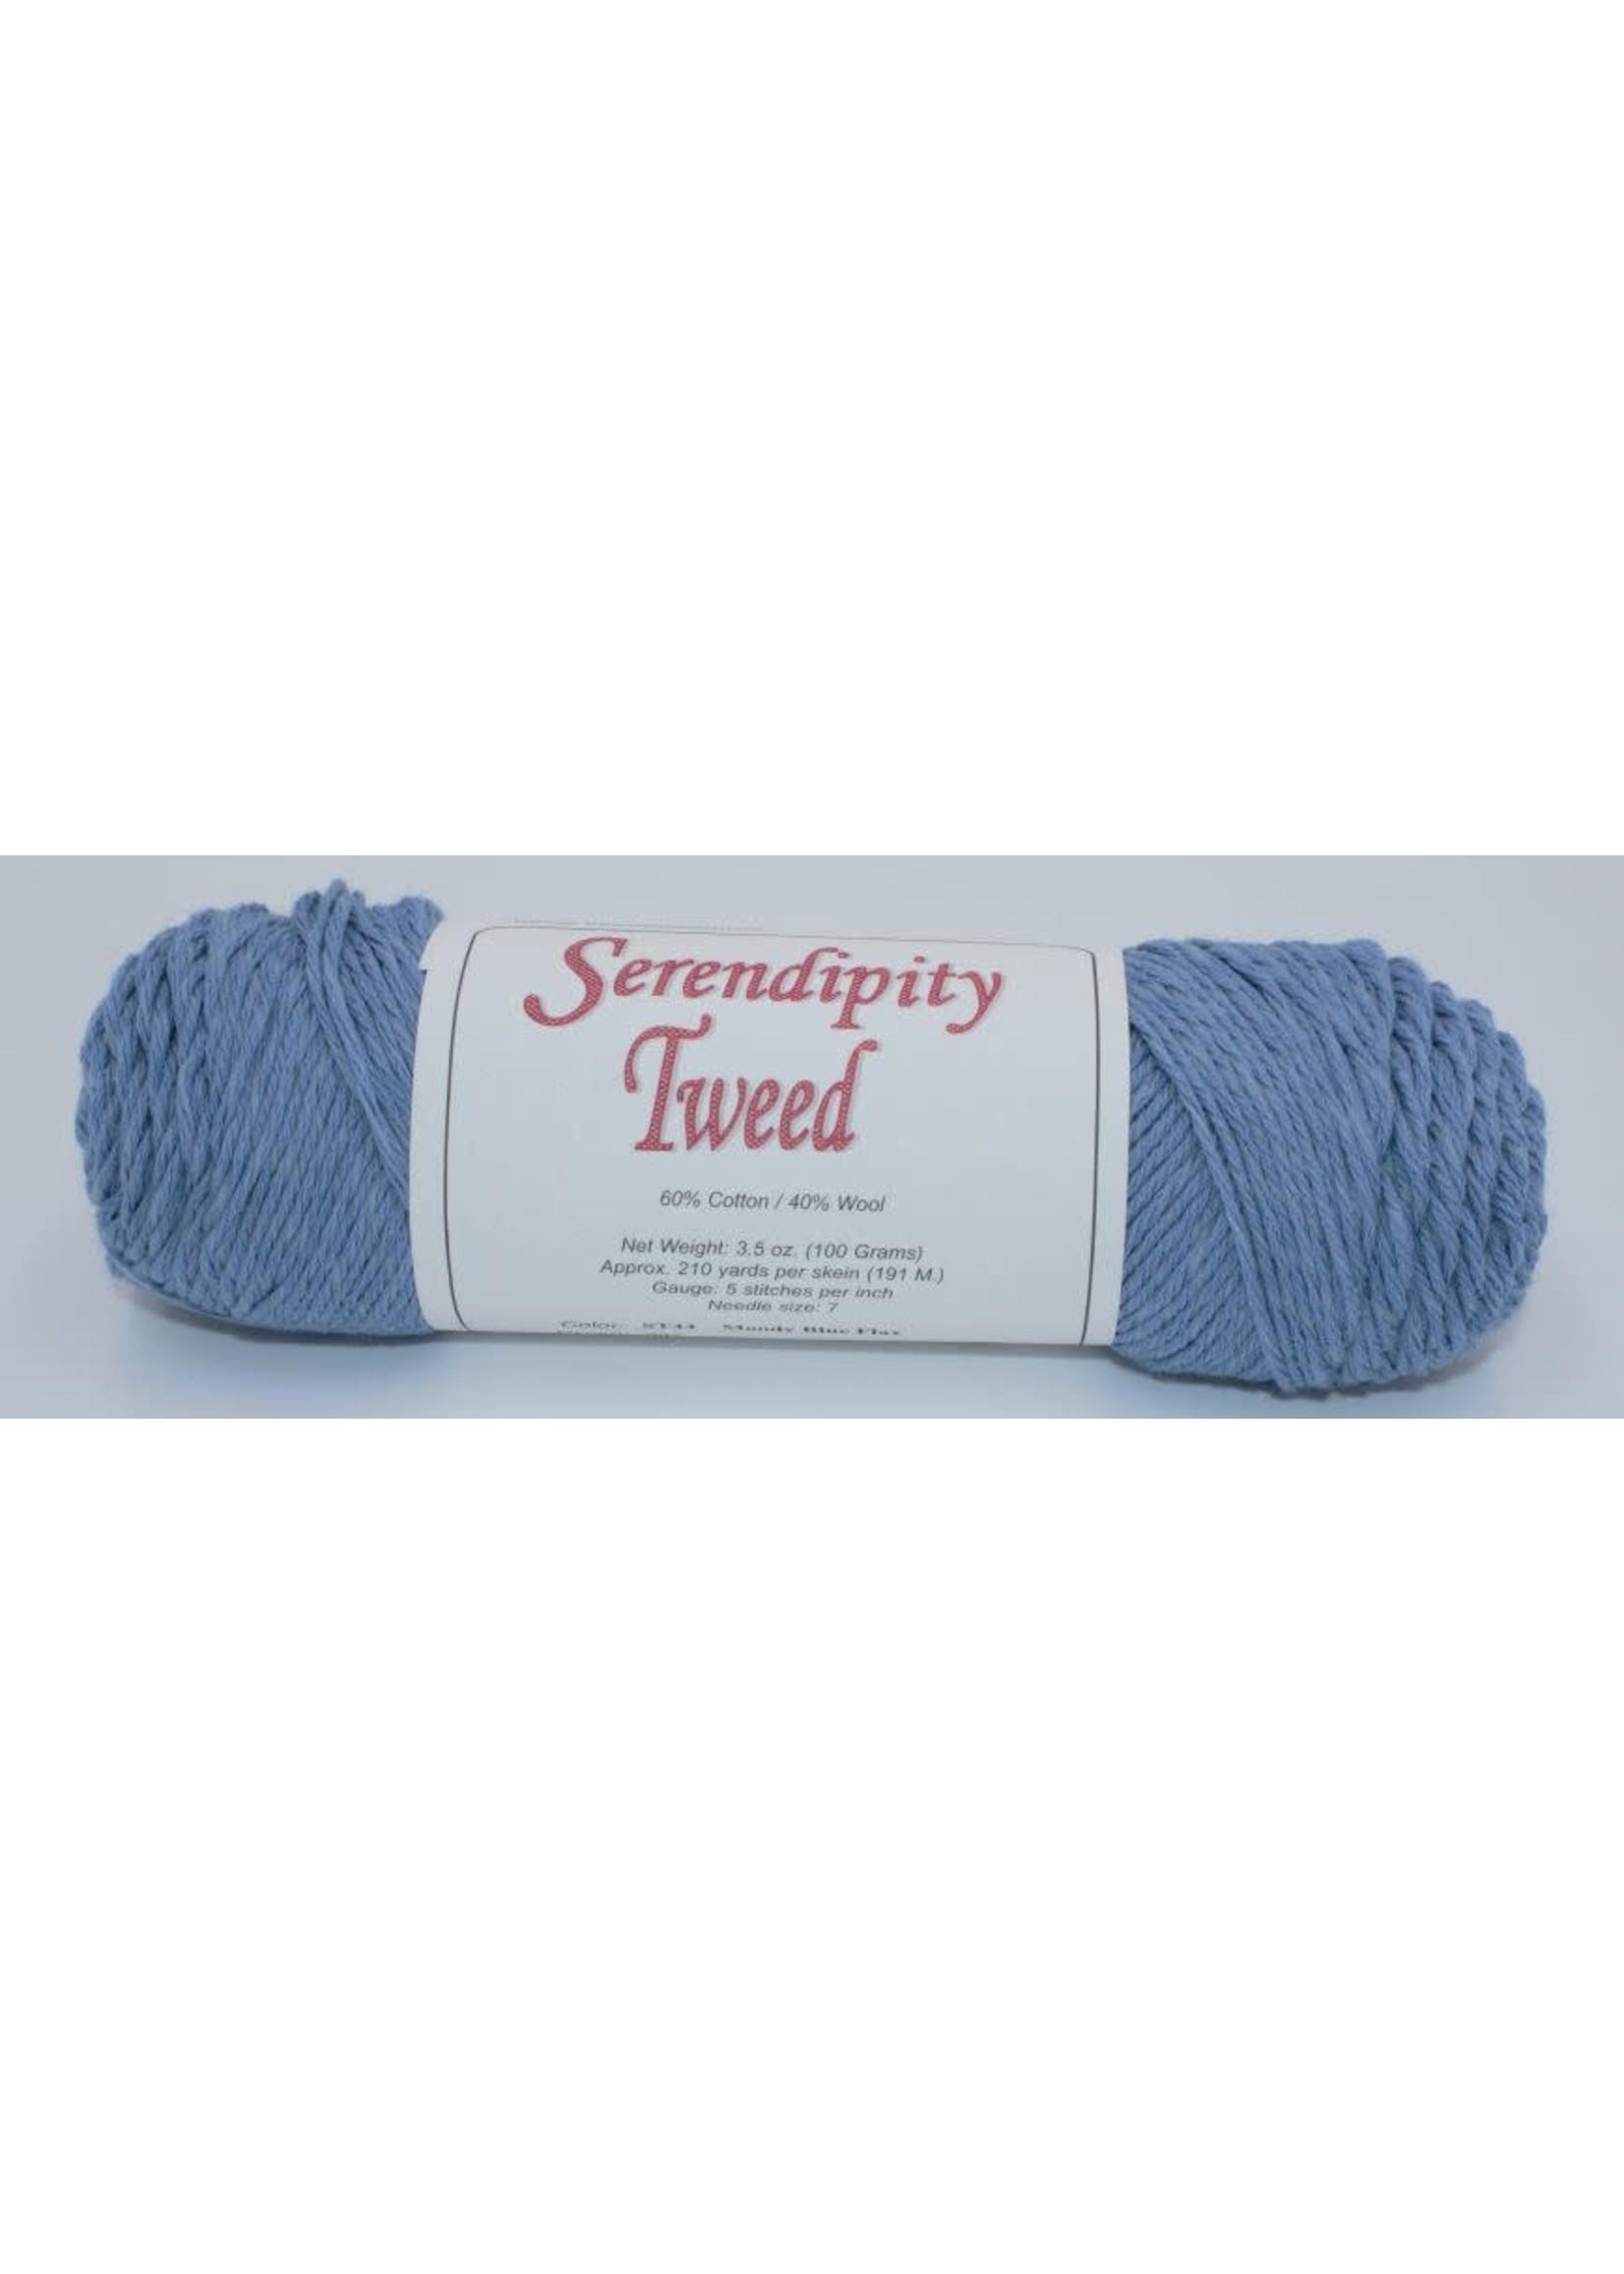 Brown Sheep Company Brown Sheep Serendipity Tweed